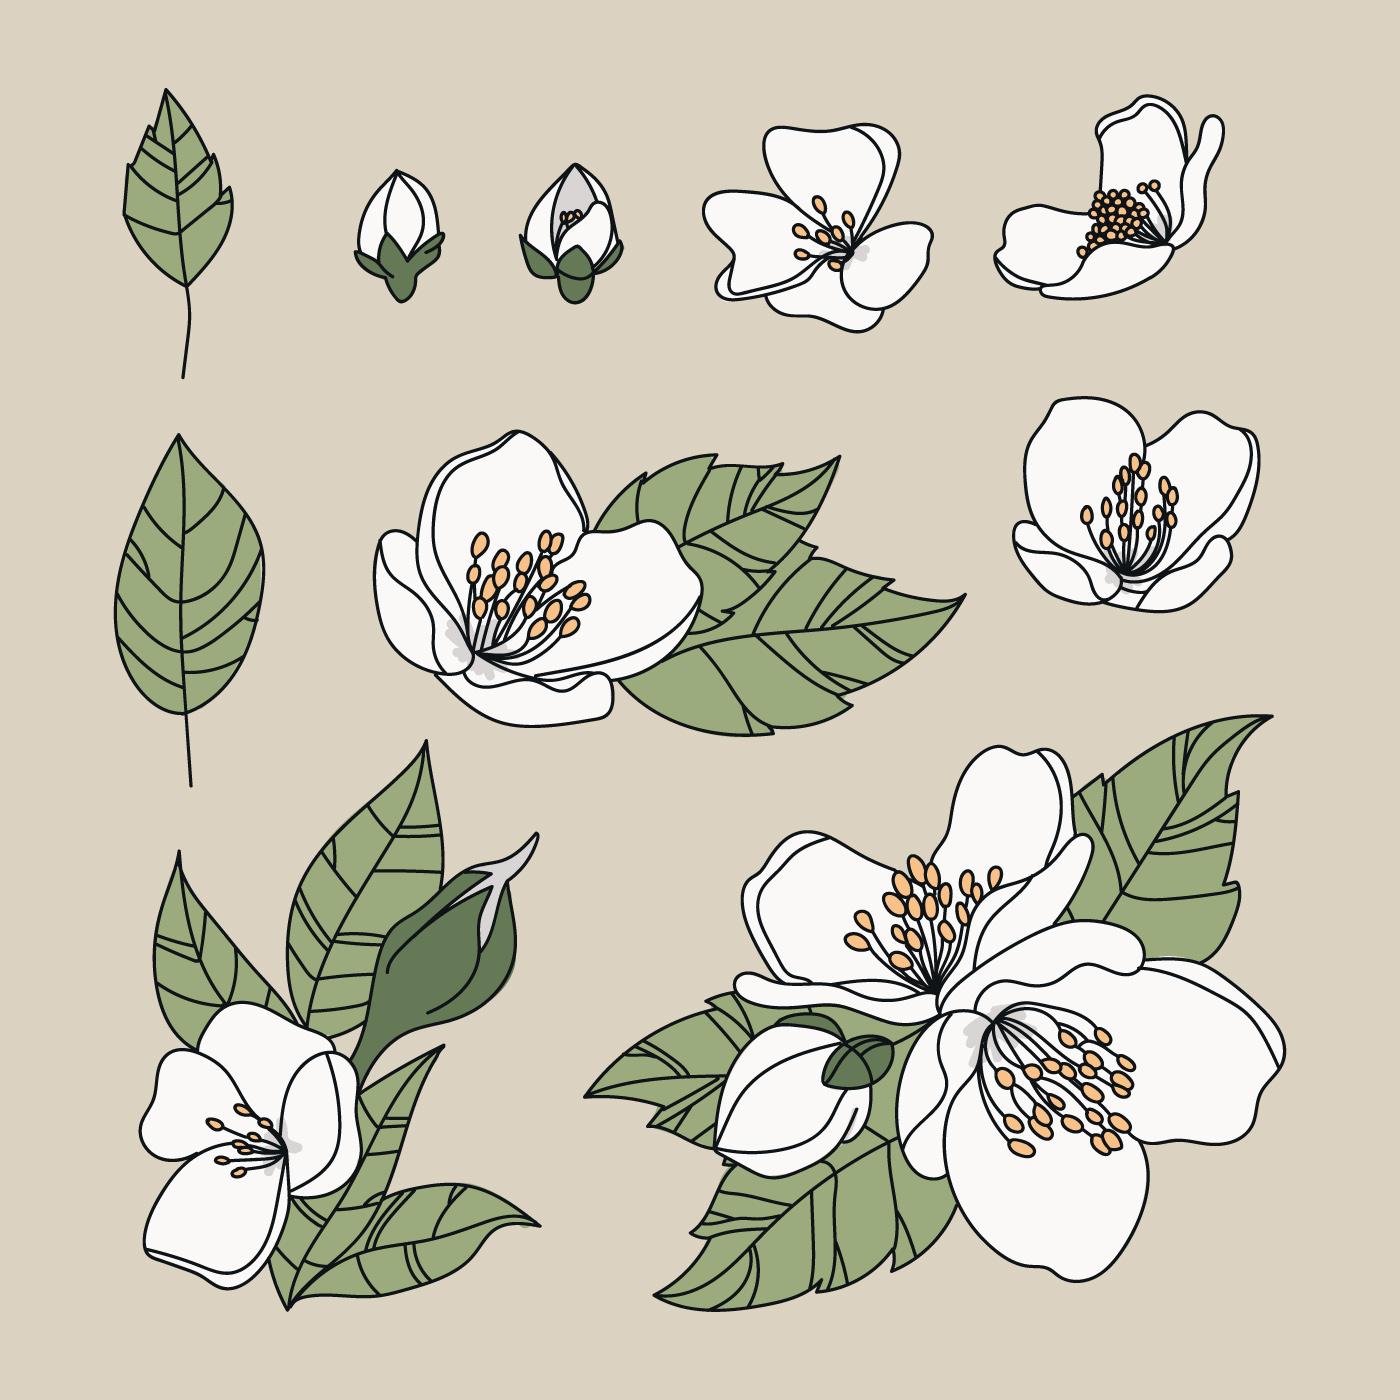 Transparent Background Jasmine Flower Png , Free Transparent Clipart -  ClipartKey